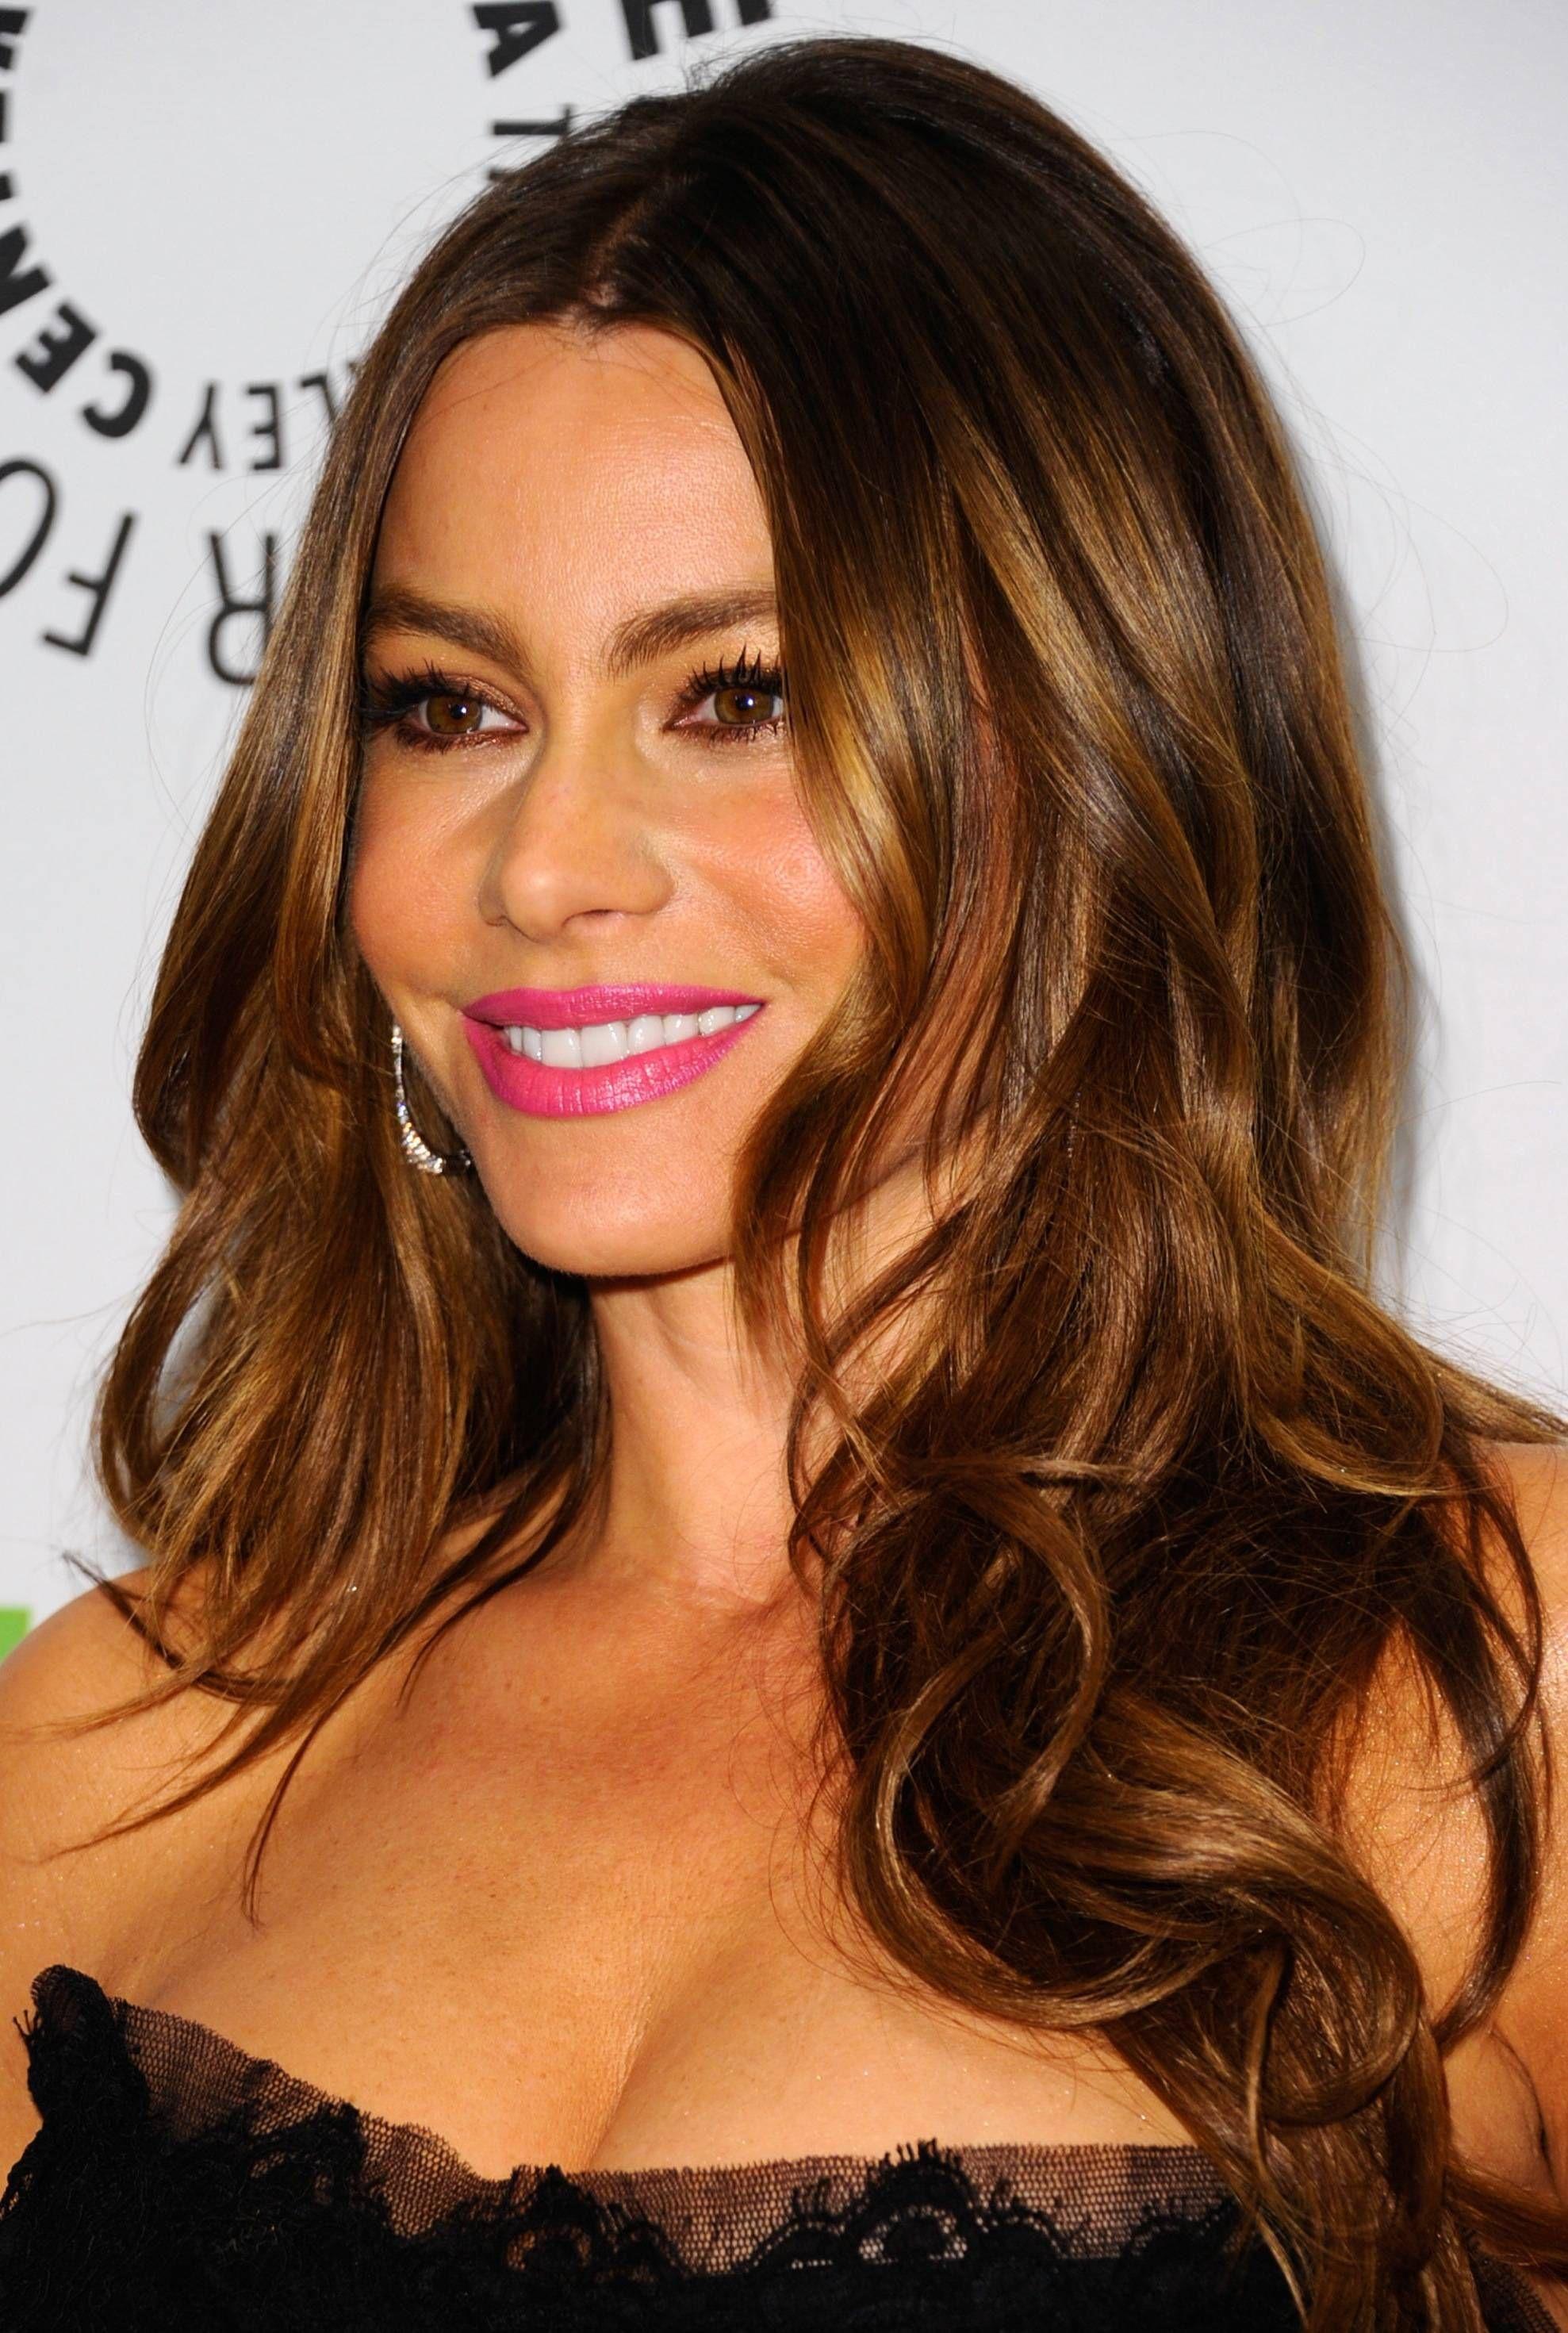 19 Ways to Style Long, Wavy Hair | Sophia vergara, Hair coloring and ...